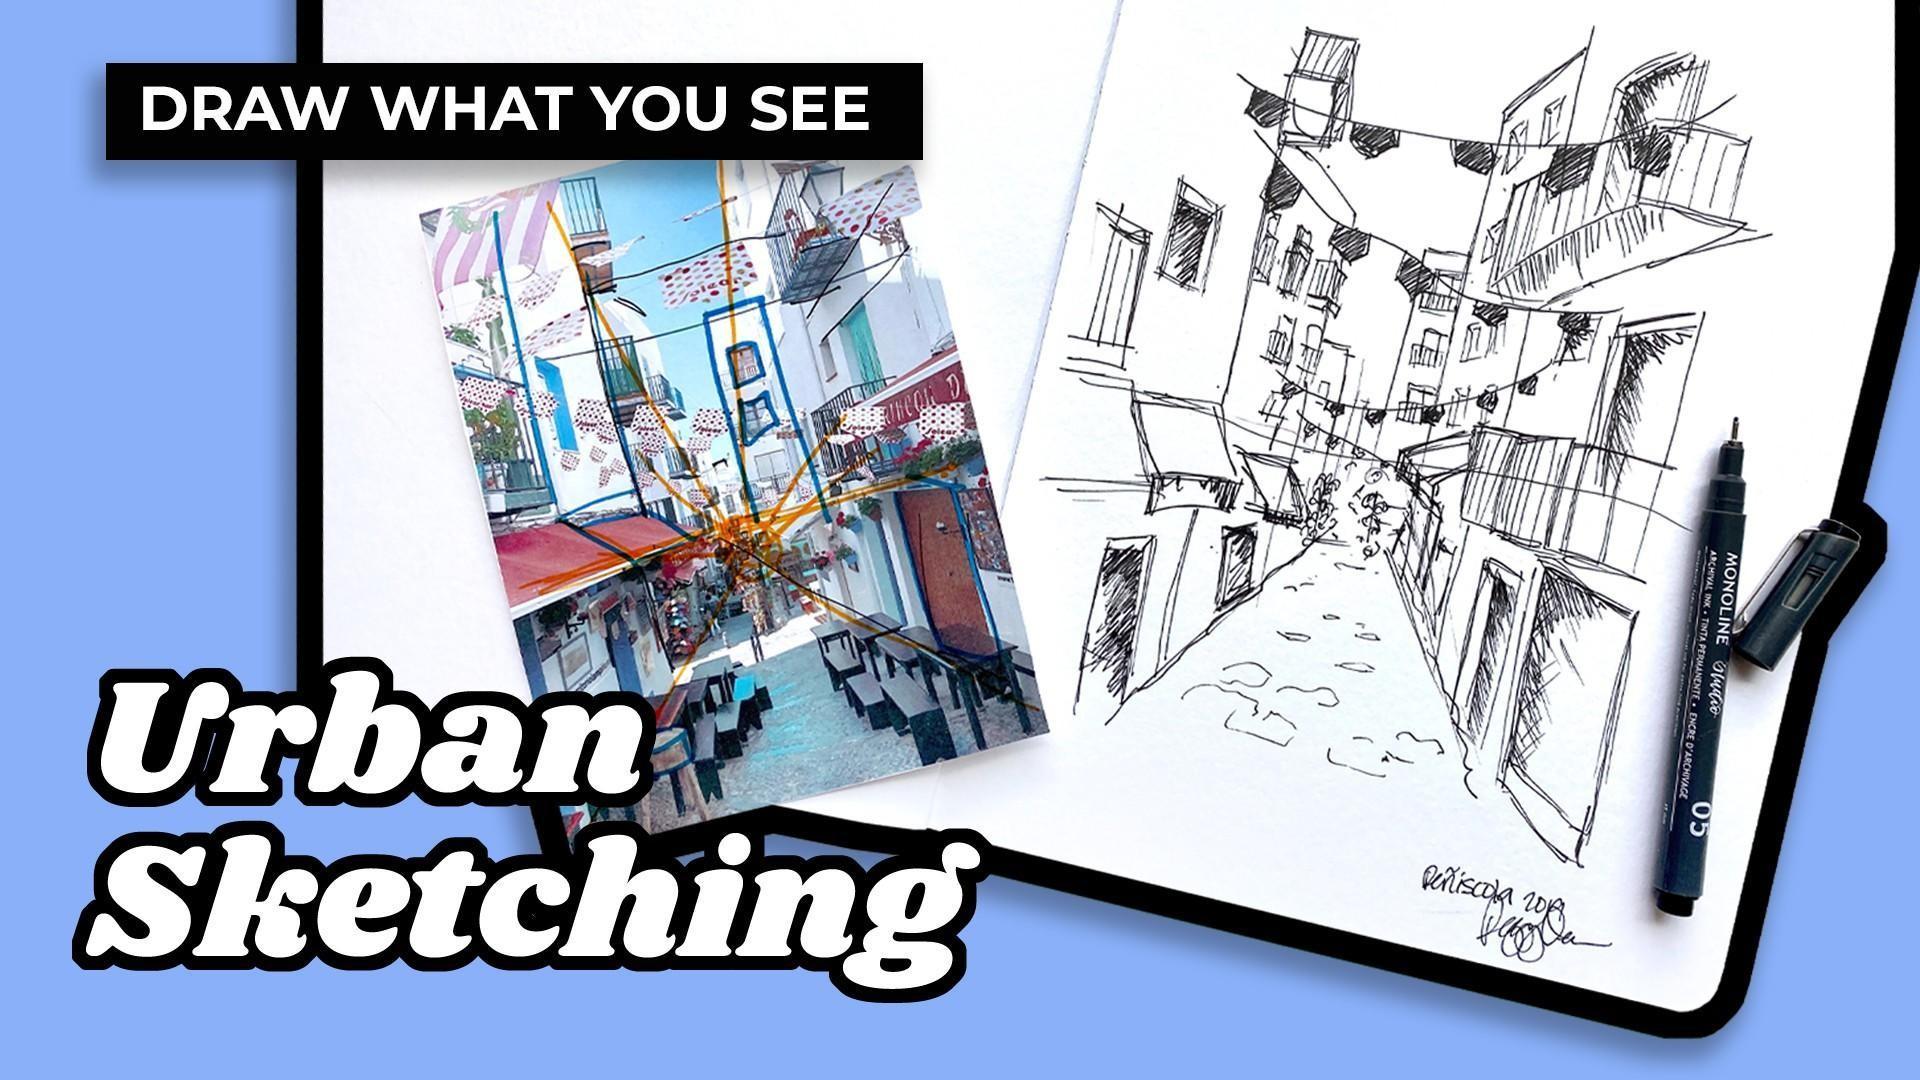 learn urban sketching